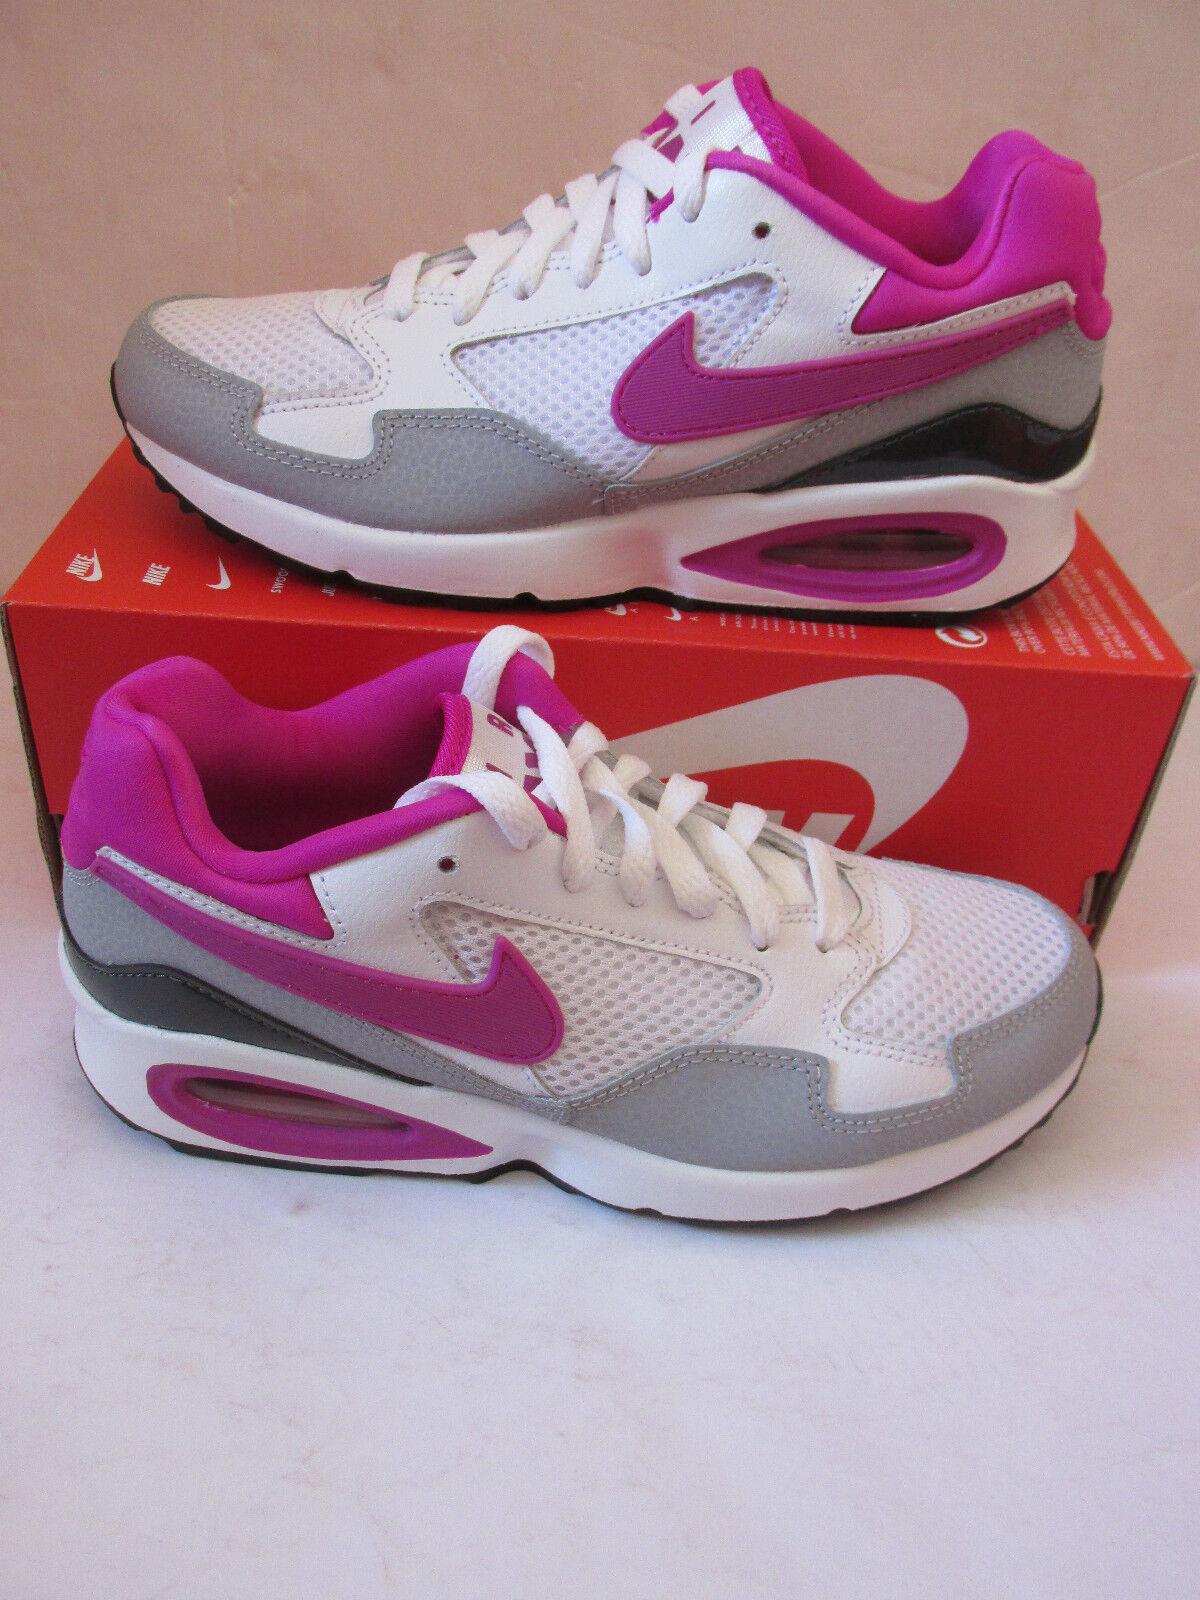 Nike Laufschuhe Damen Air Max St Laufschuhe Nike 705003 103 Turnschuhe 77b063